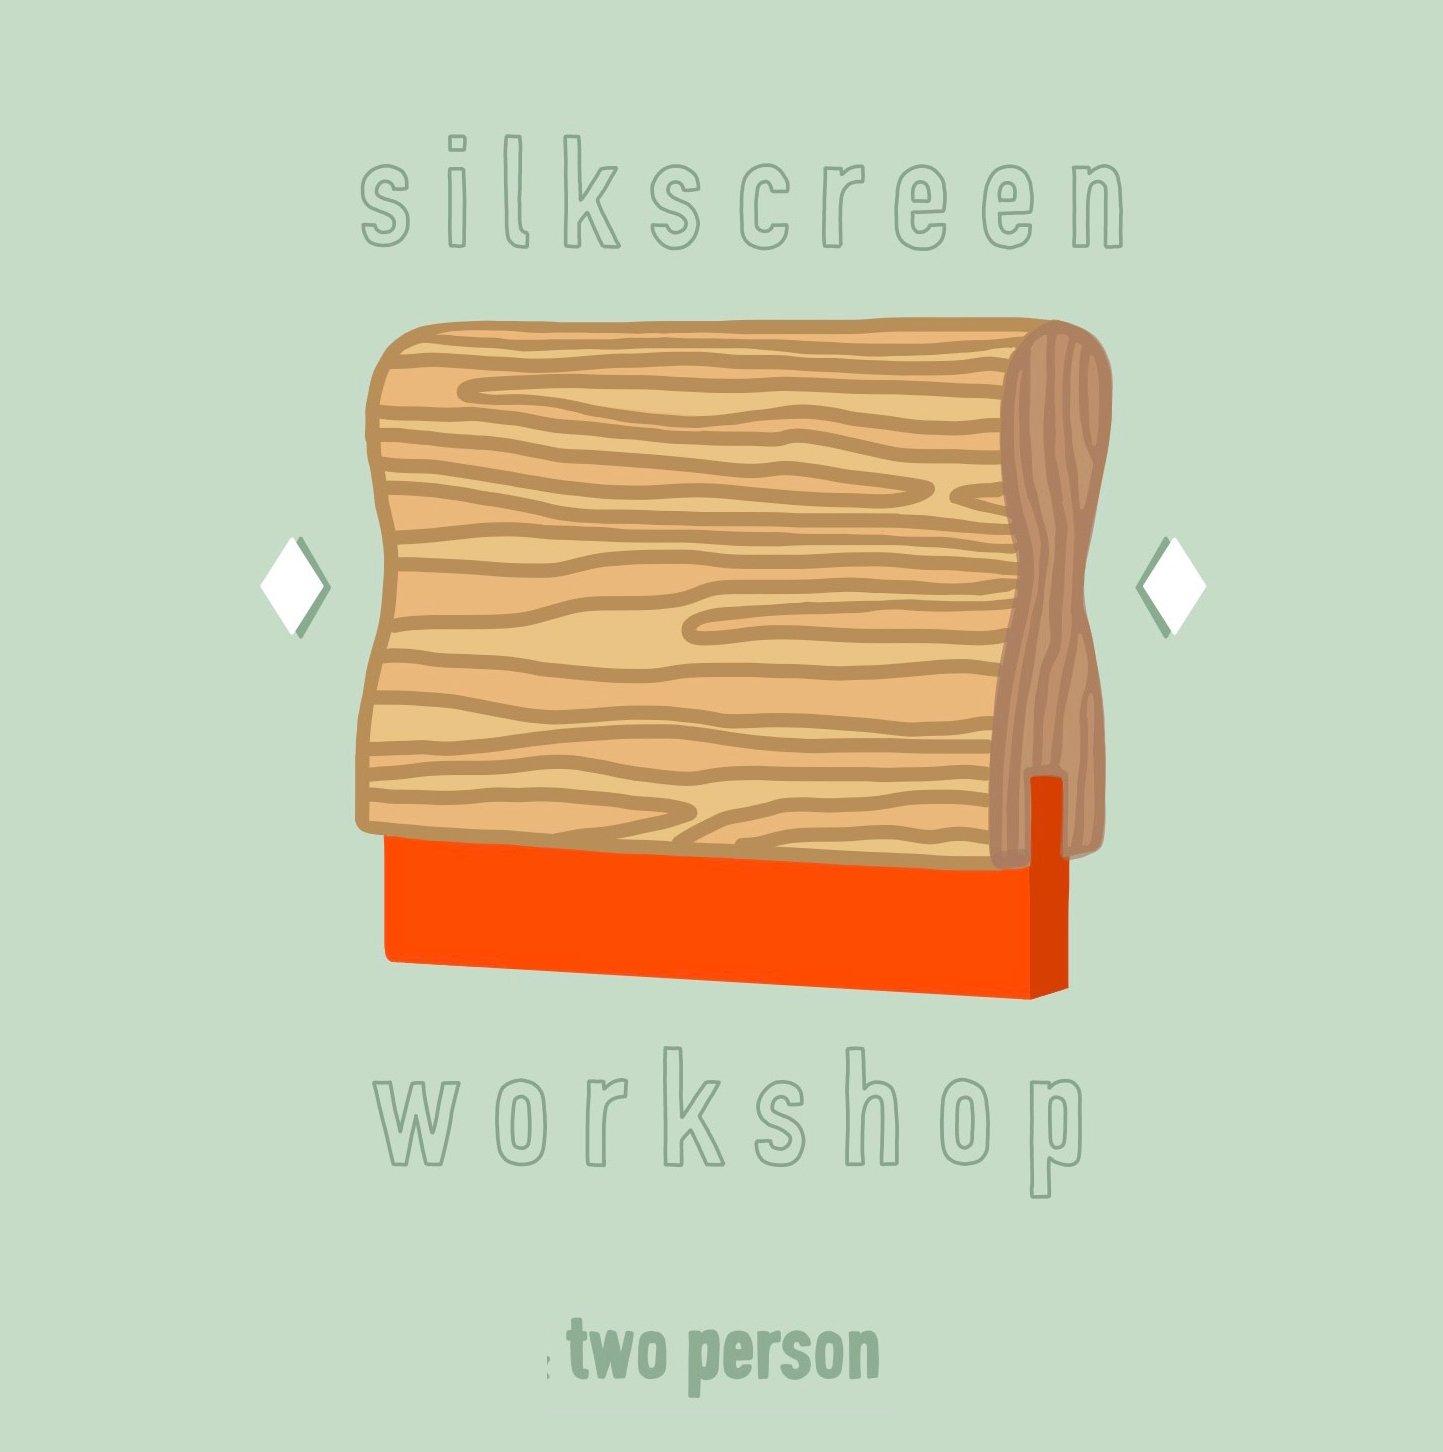 silkscreen workshop (two person)